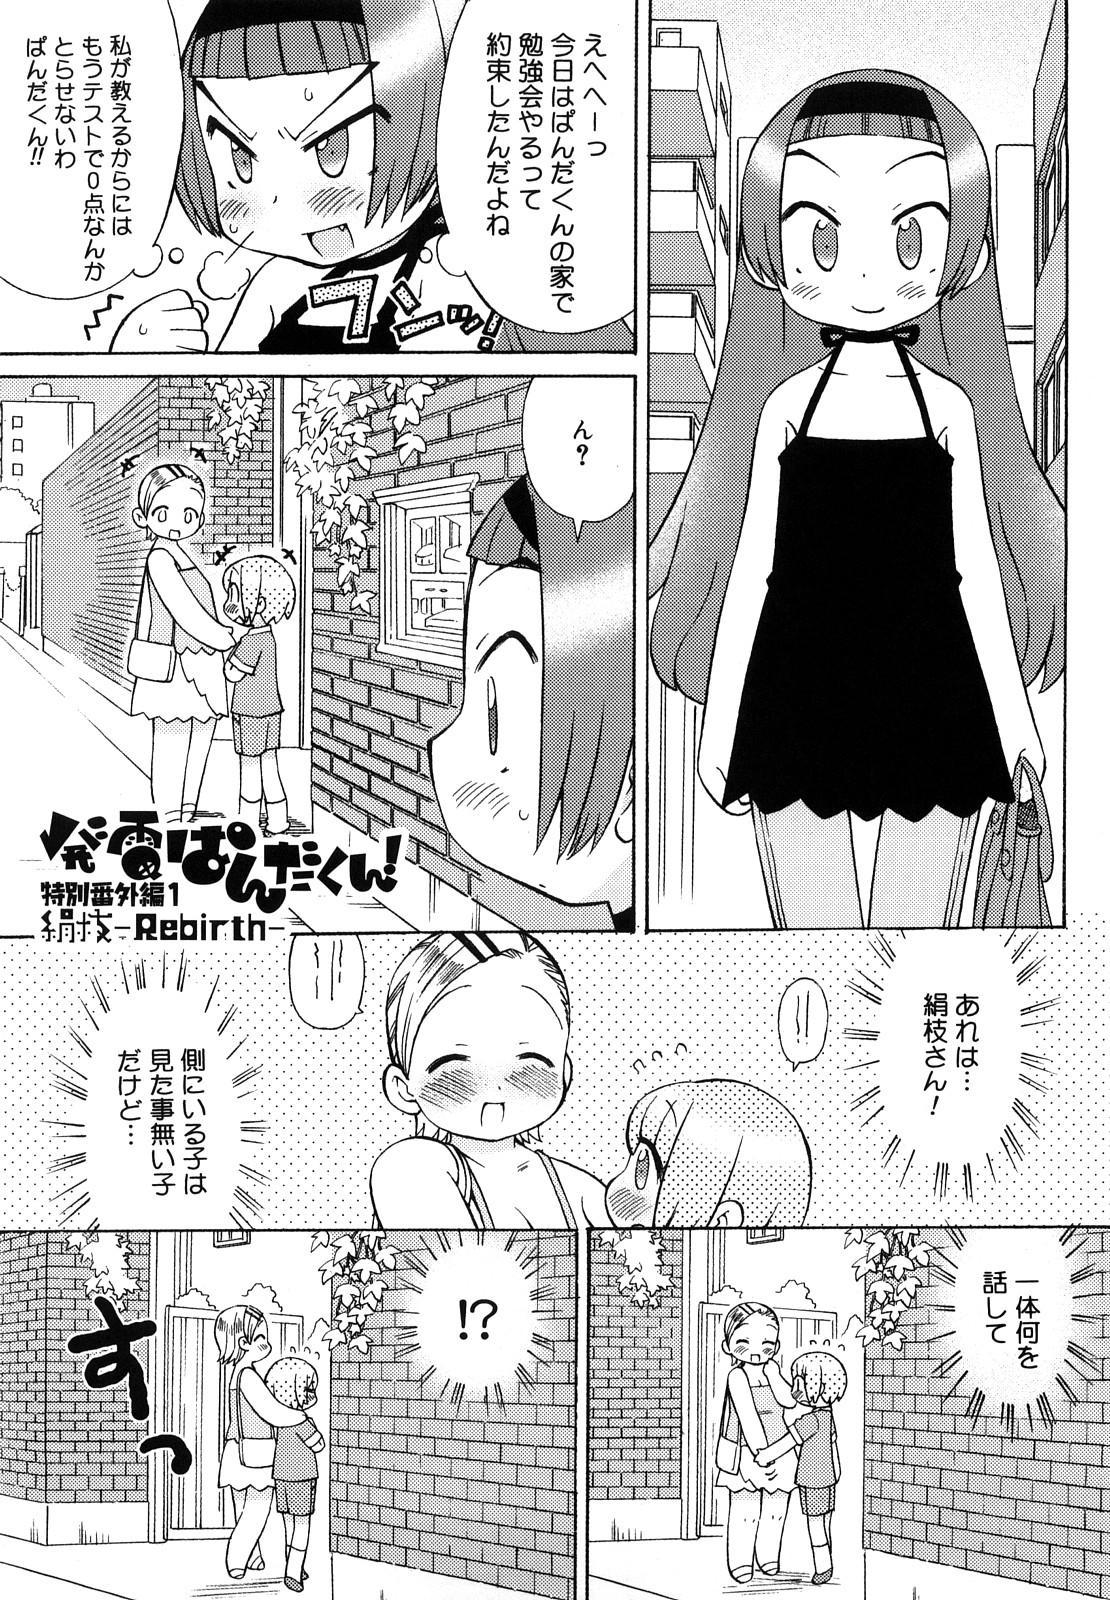 Hatsuden Pandakun! Shinsouban 193